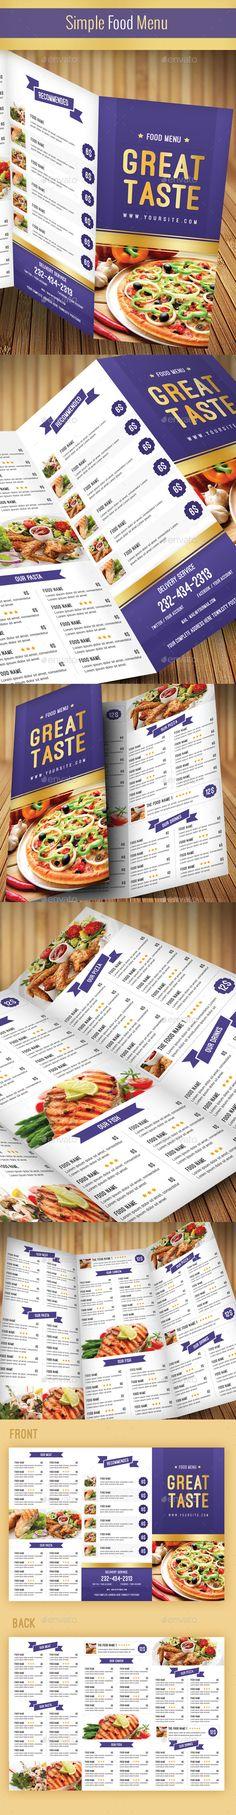 Simple Food Menu Template #design Download: http://graphicriver.net/item/simple-food-menu/10049870?ref=ksioks